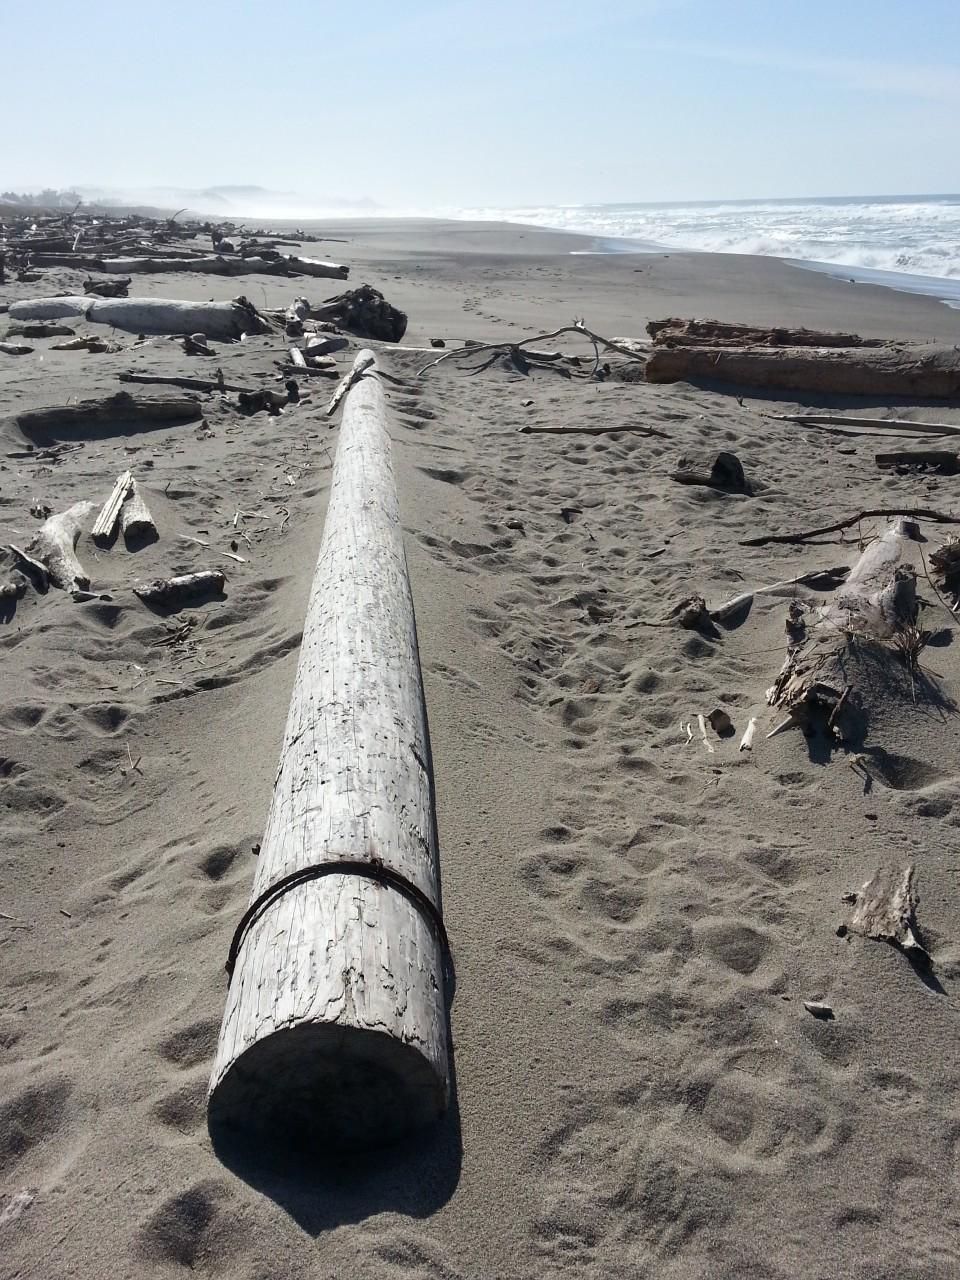 Telephone pole among the driftwood